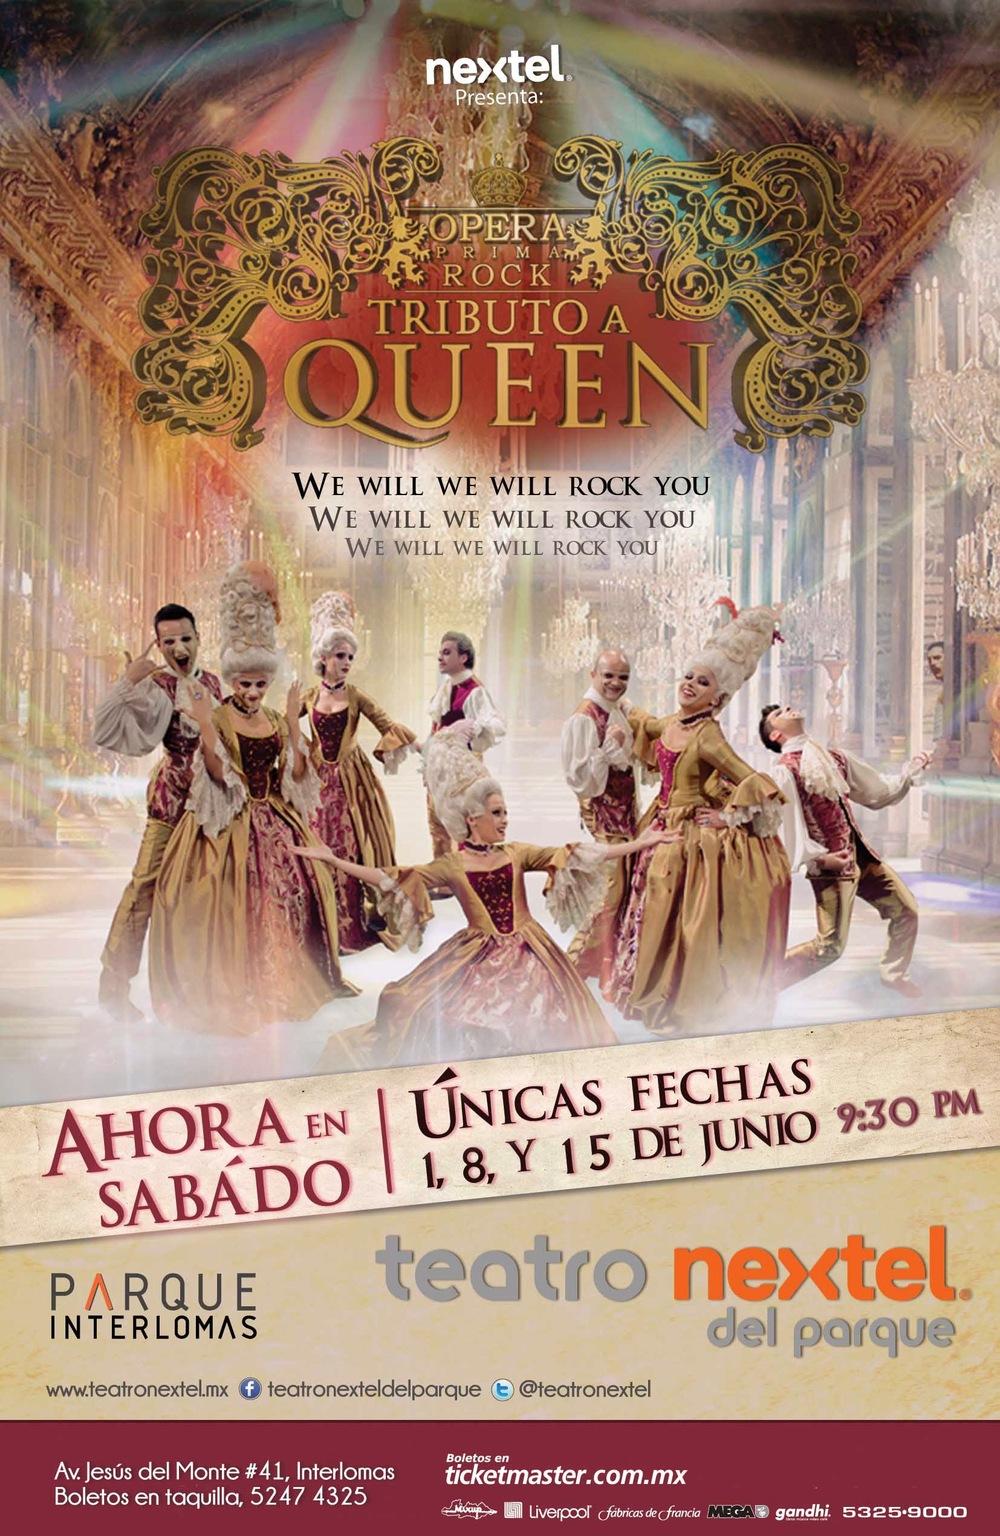 Opera Prima Flyer Nextel sábados 2013 (twitter).jpg